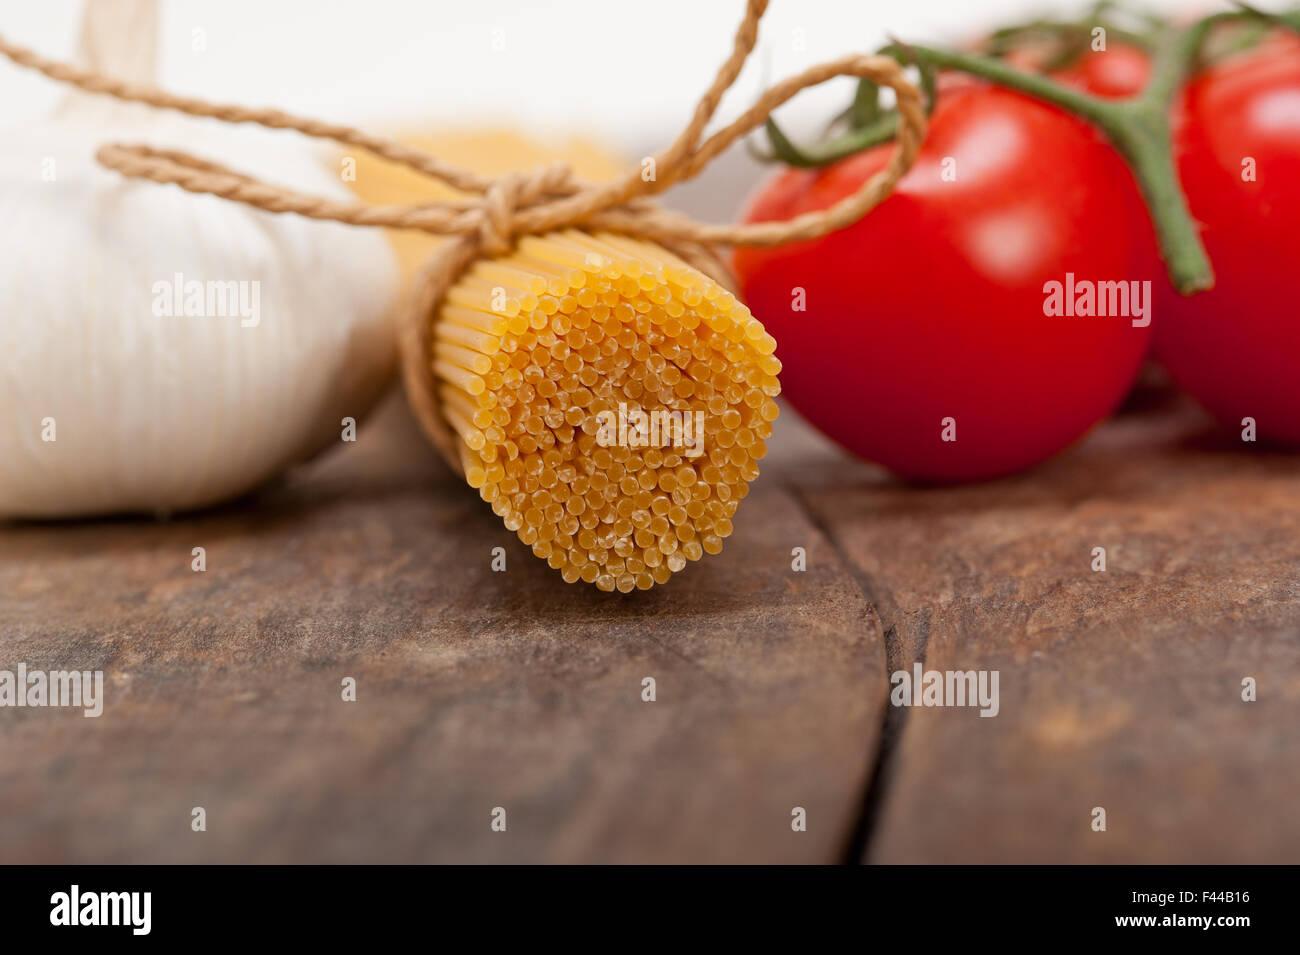 Italian basic pasta ingredients - Stock Image